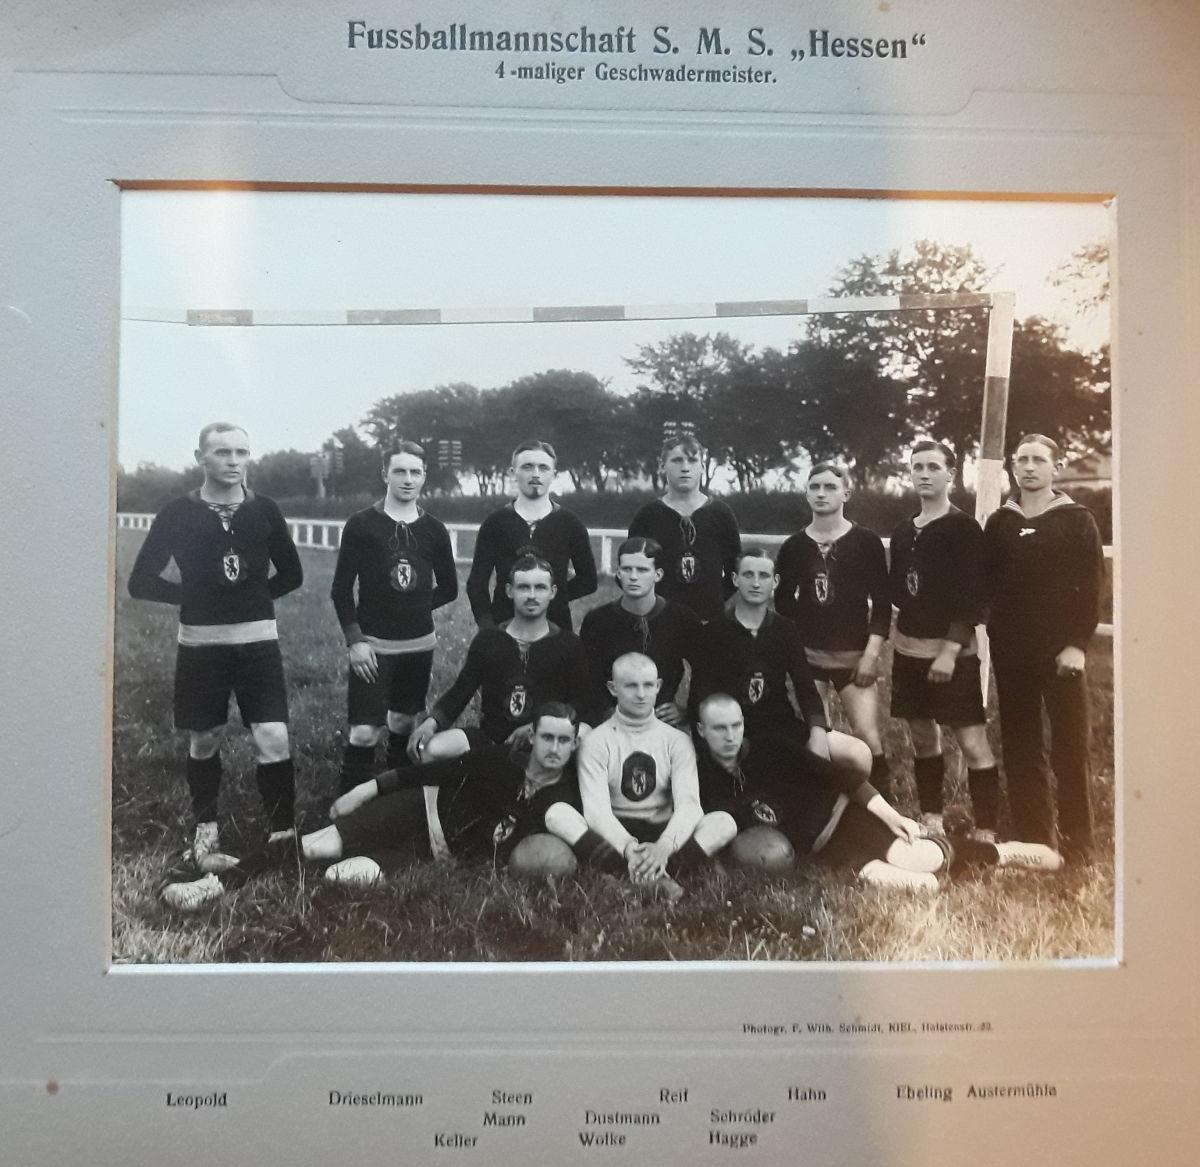 S.M.S. Hessen, Fußballmannschaft